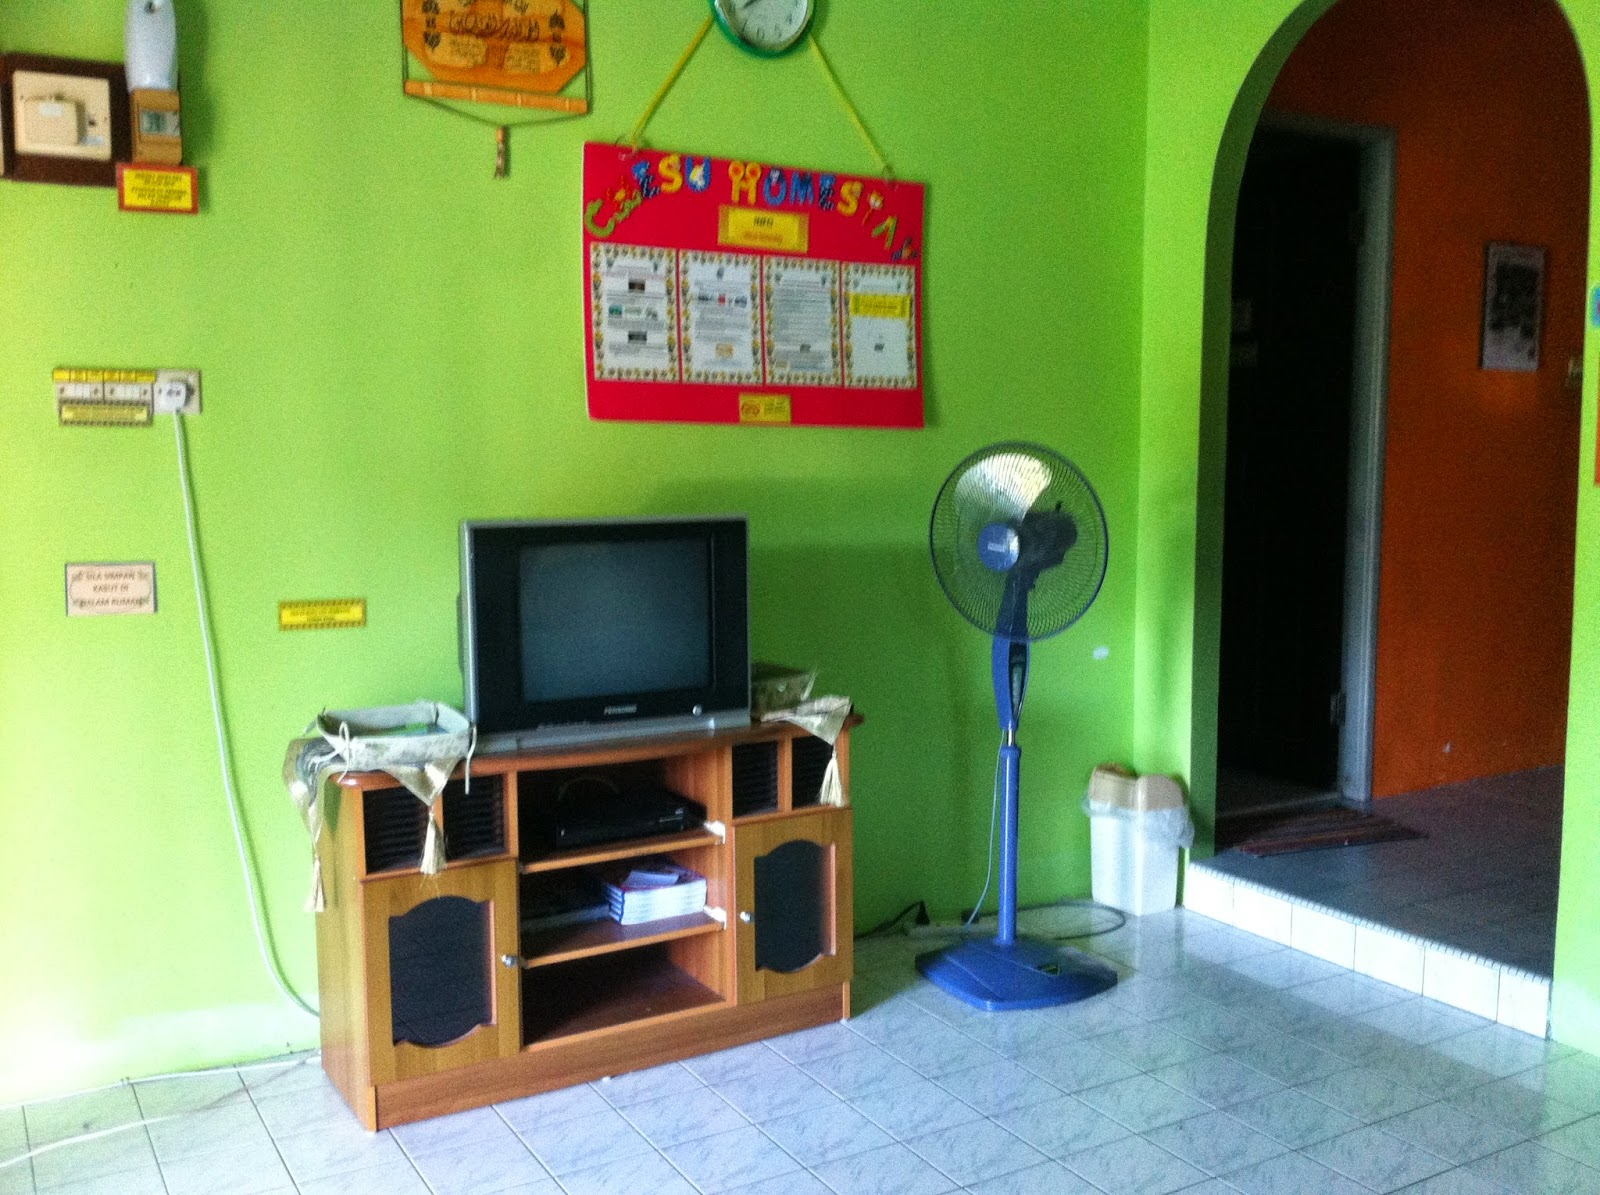 Ruang Dapur Kitchen Cabinet Gas Dan Alatan Memasak